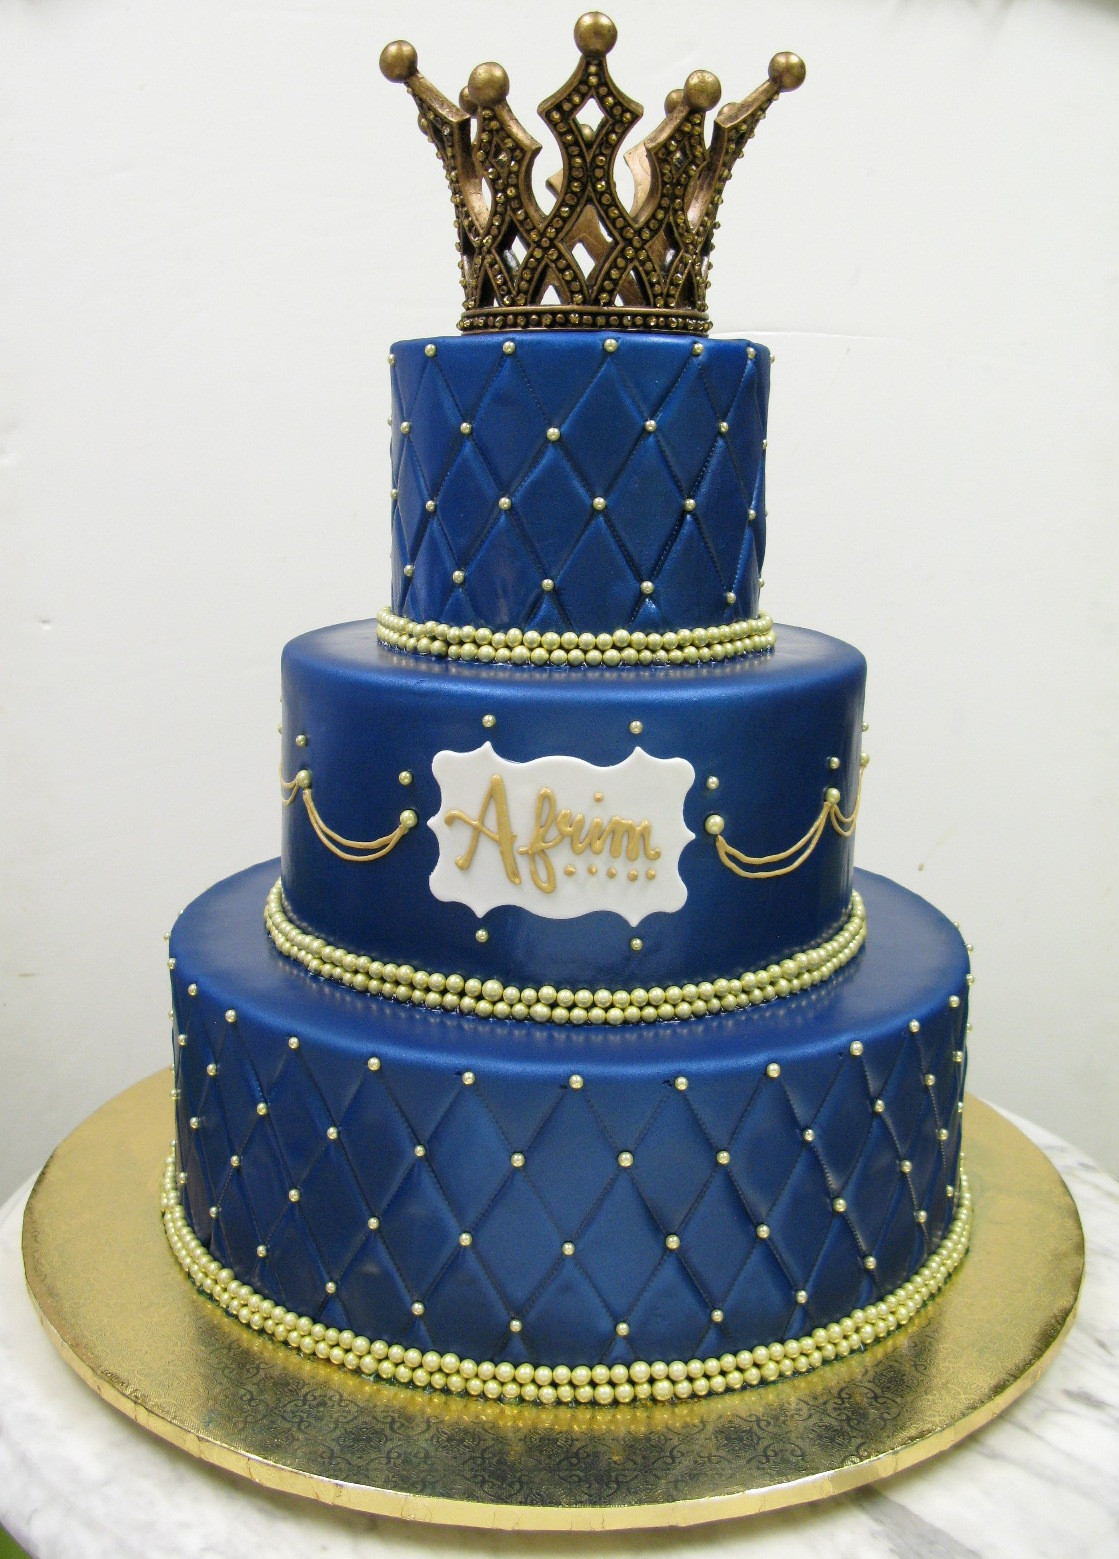 Prince Birthday Cake  —Royalty Prince & Princess – Mother Mousse